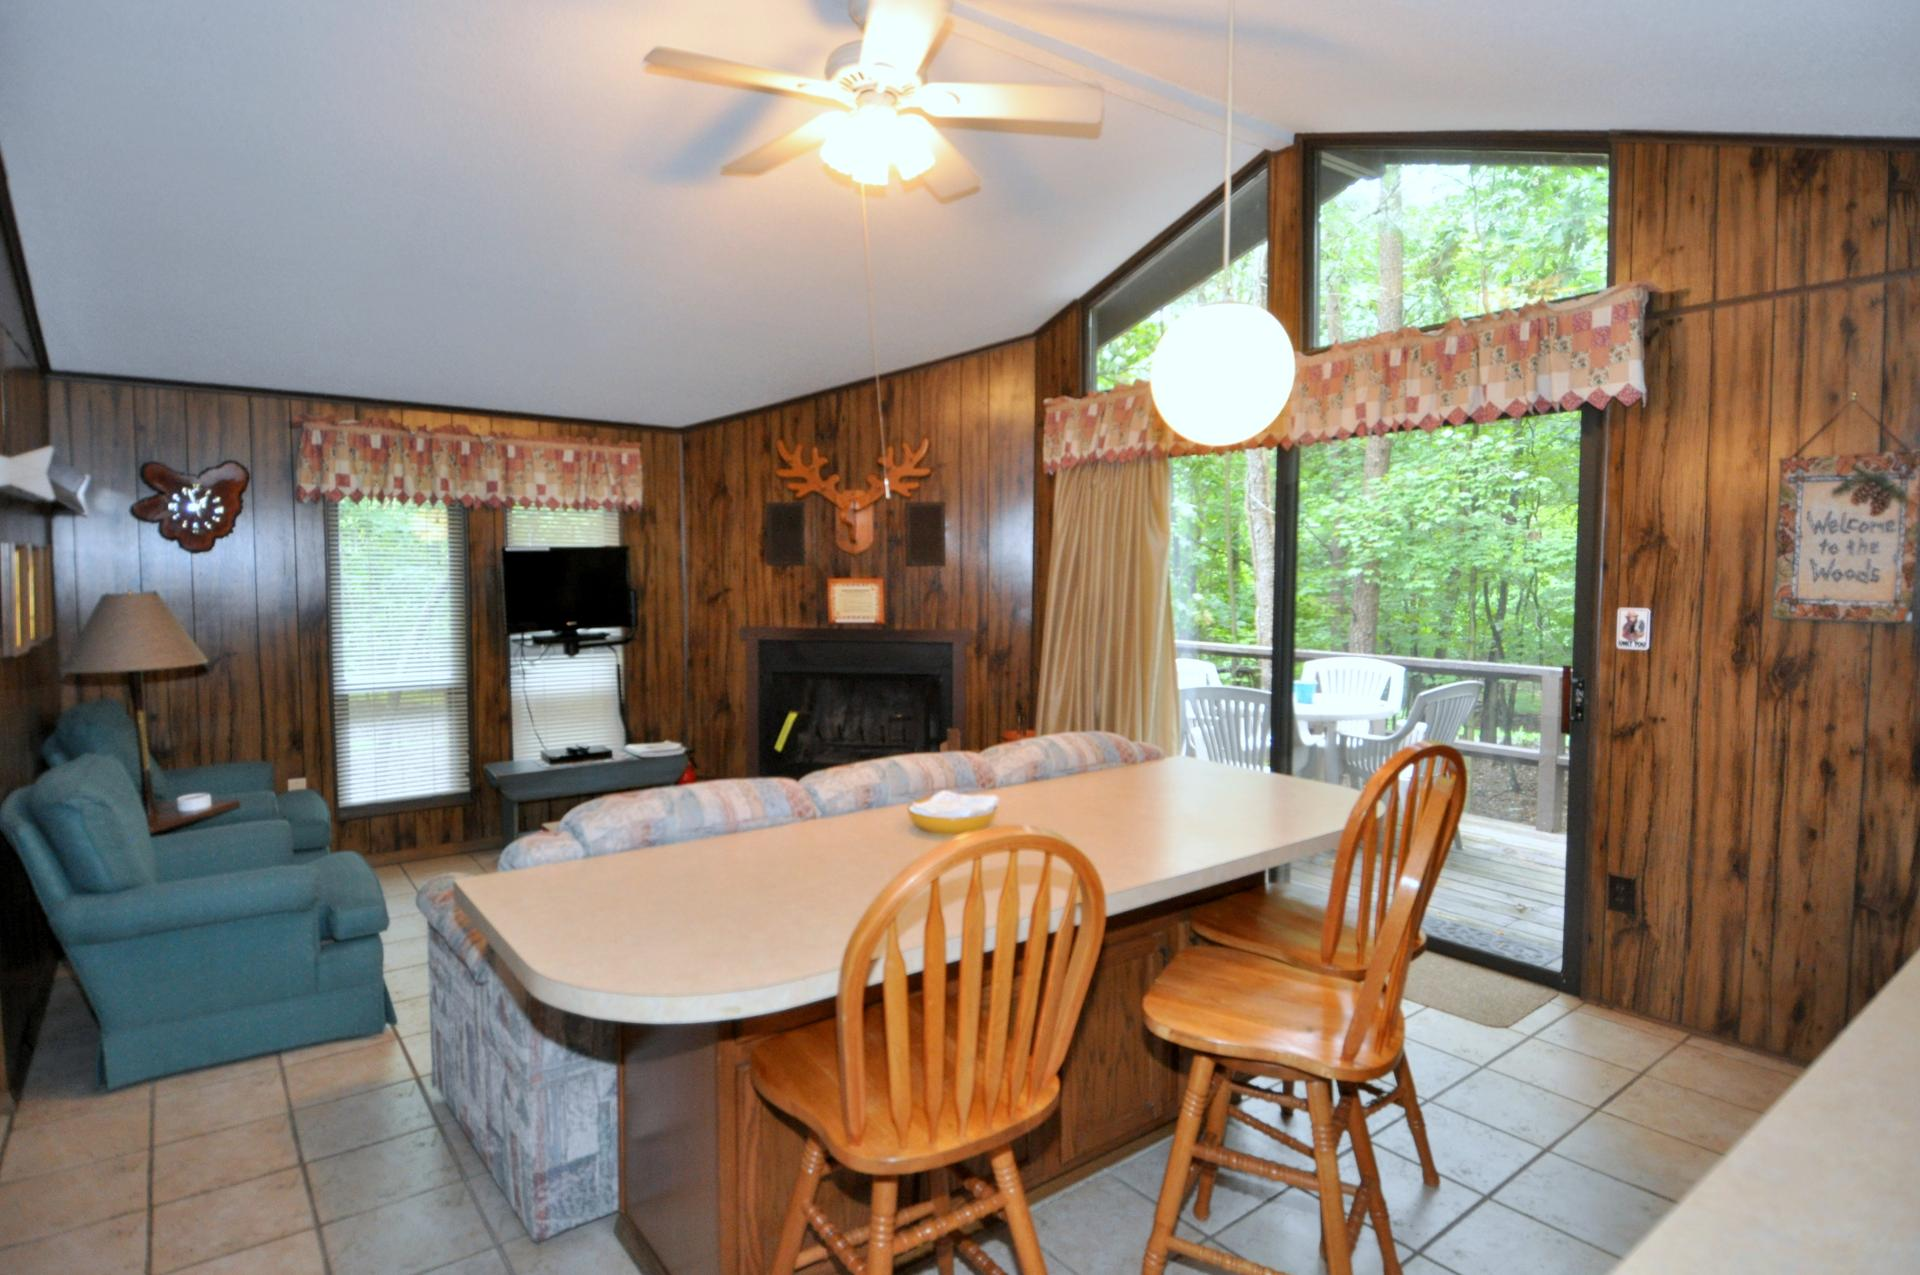 Rental Details Berkeley Springs Cottage Rentals